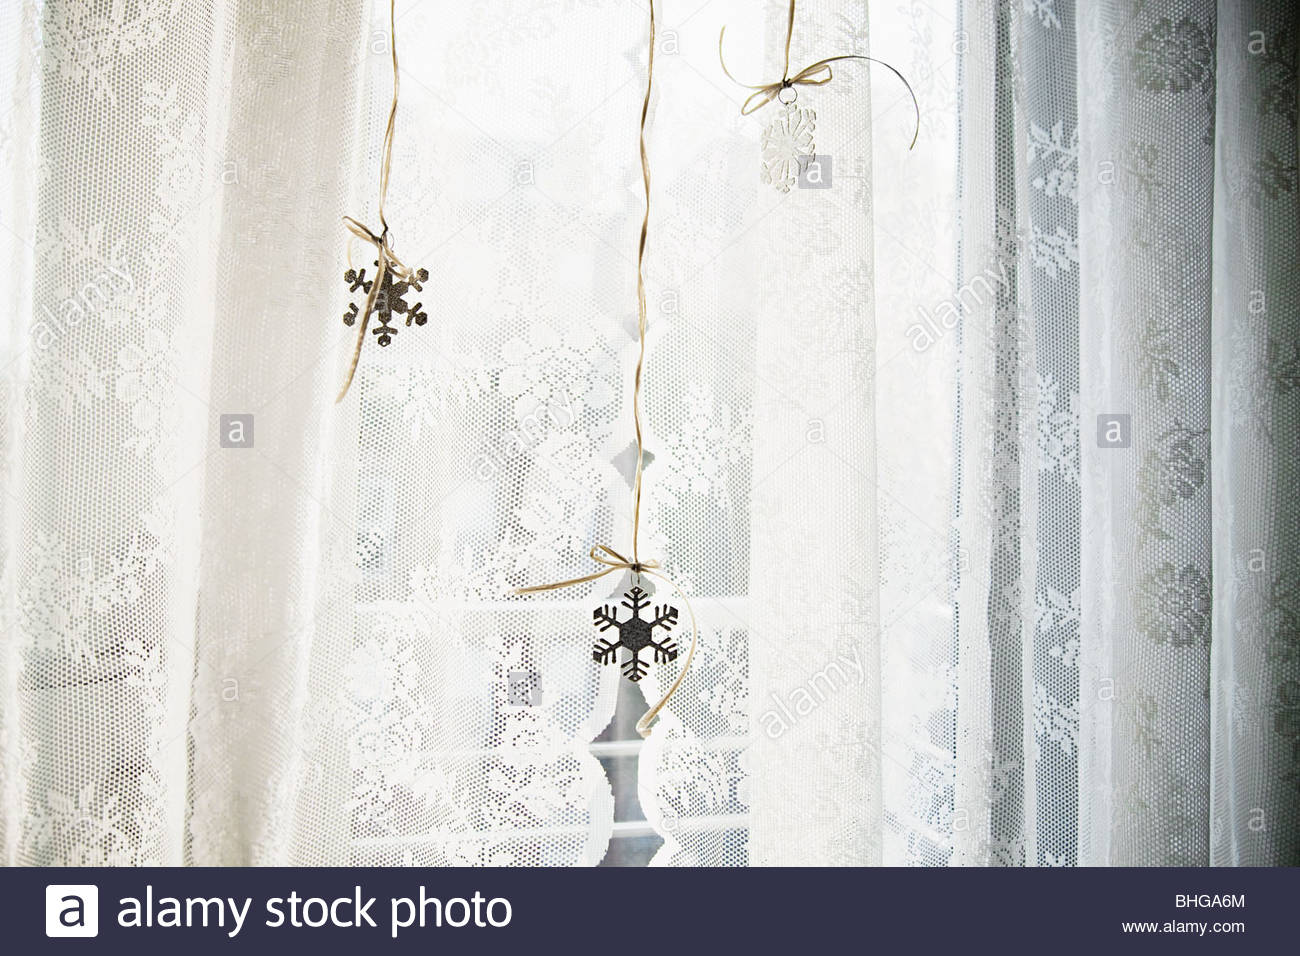 Snowflake decorations in window - Stock Image